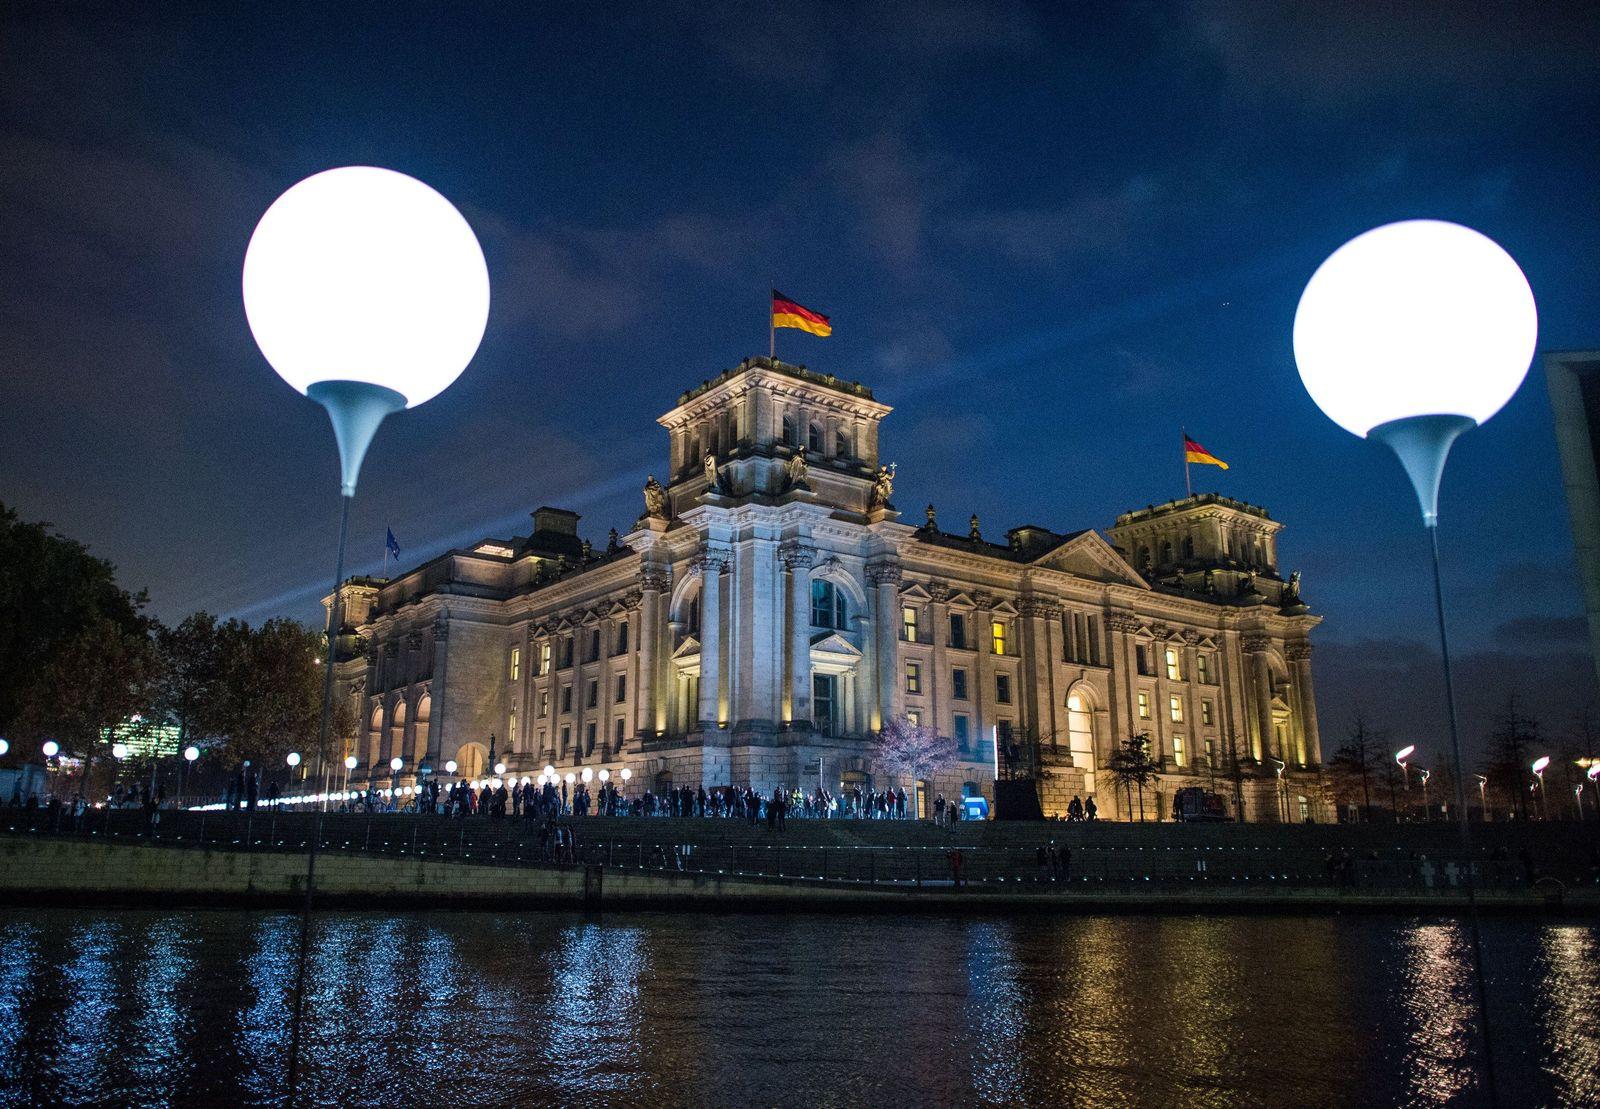 Lichtmauer Berlin